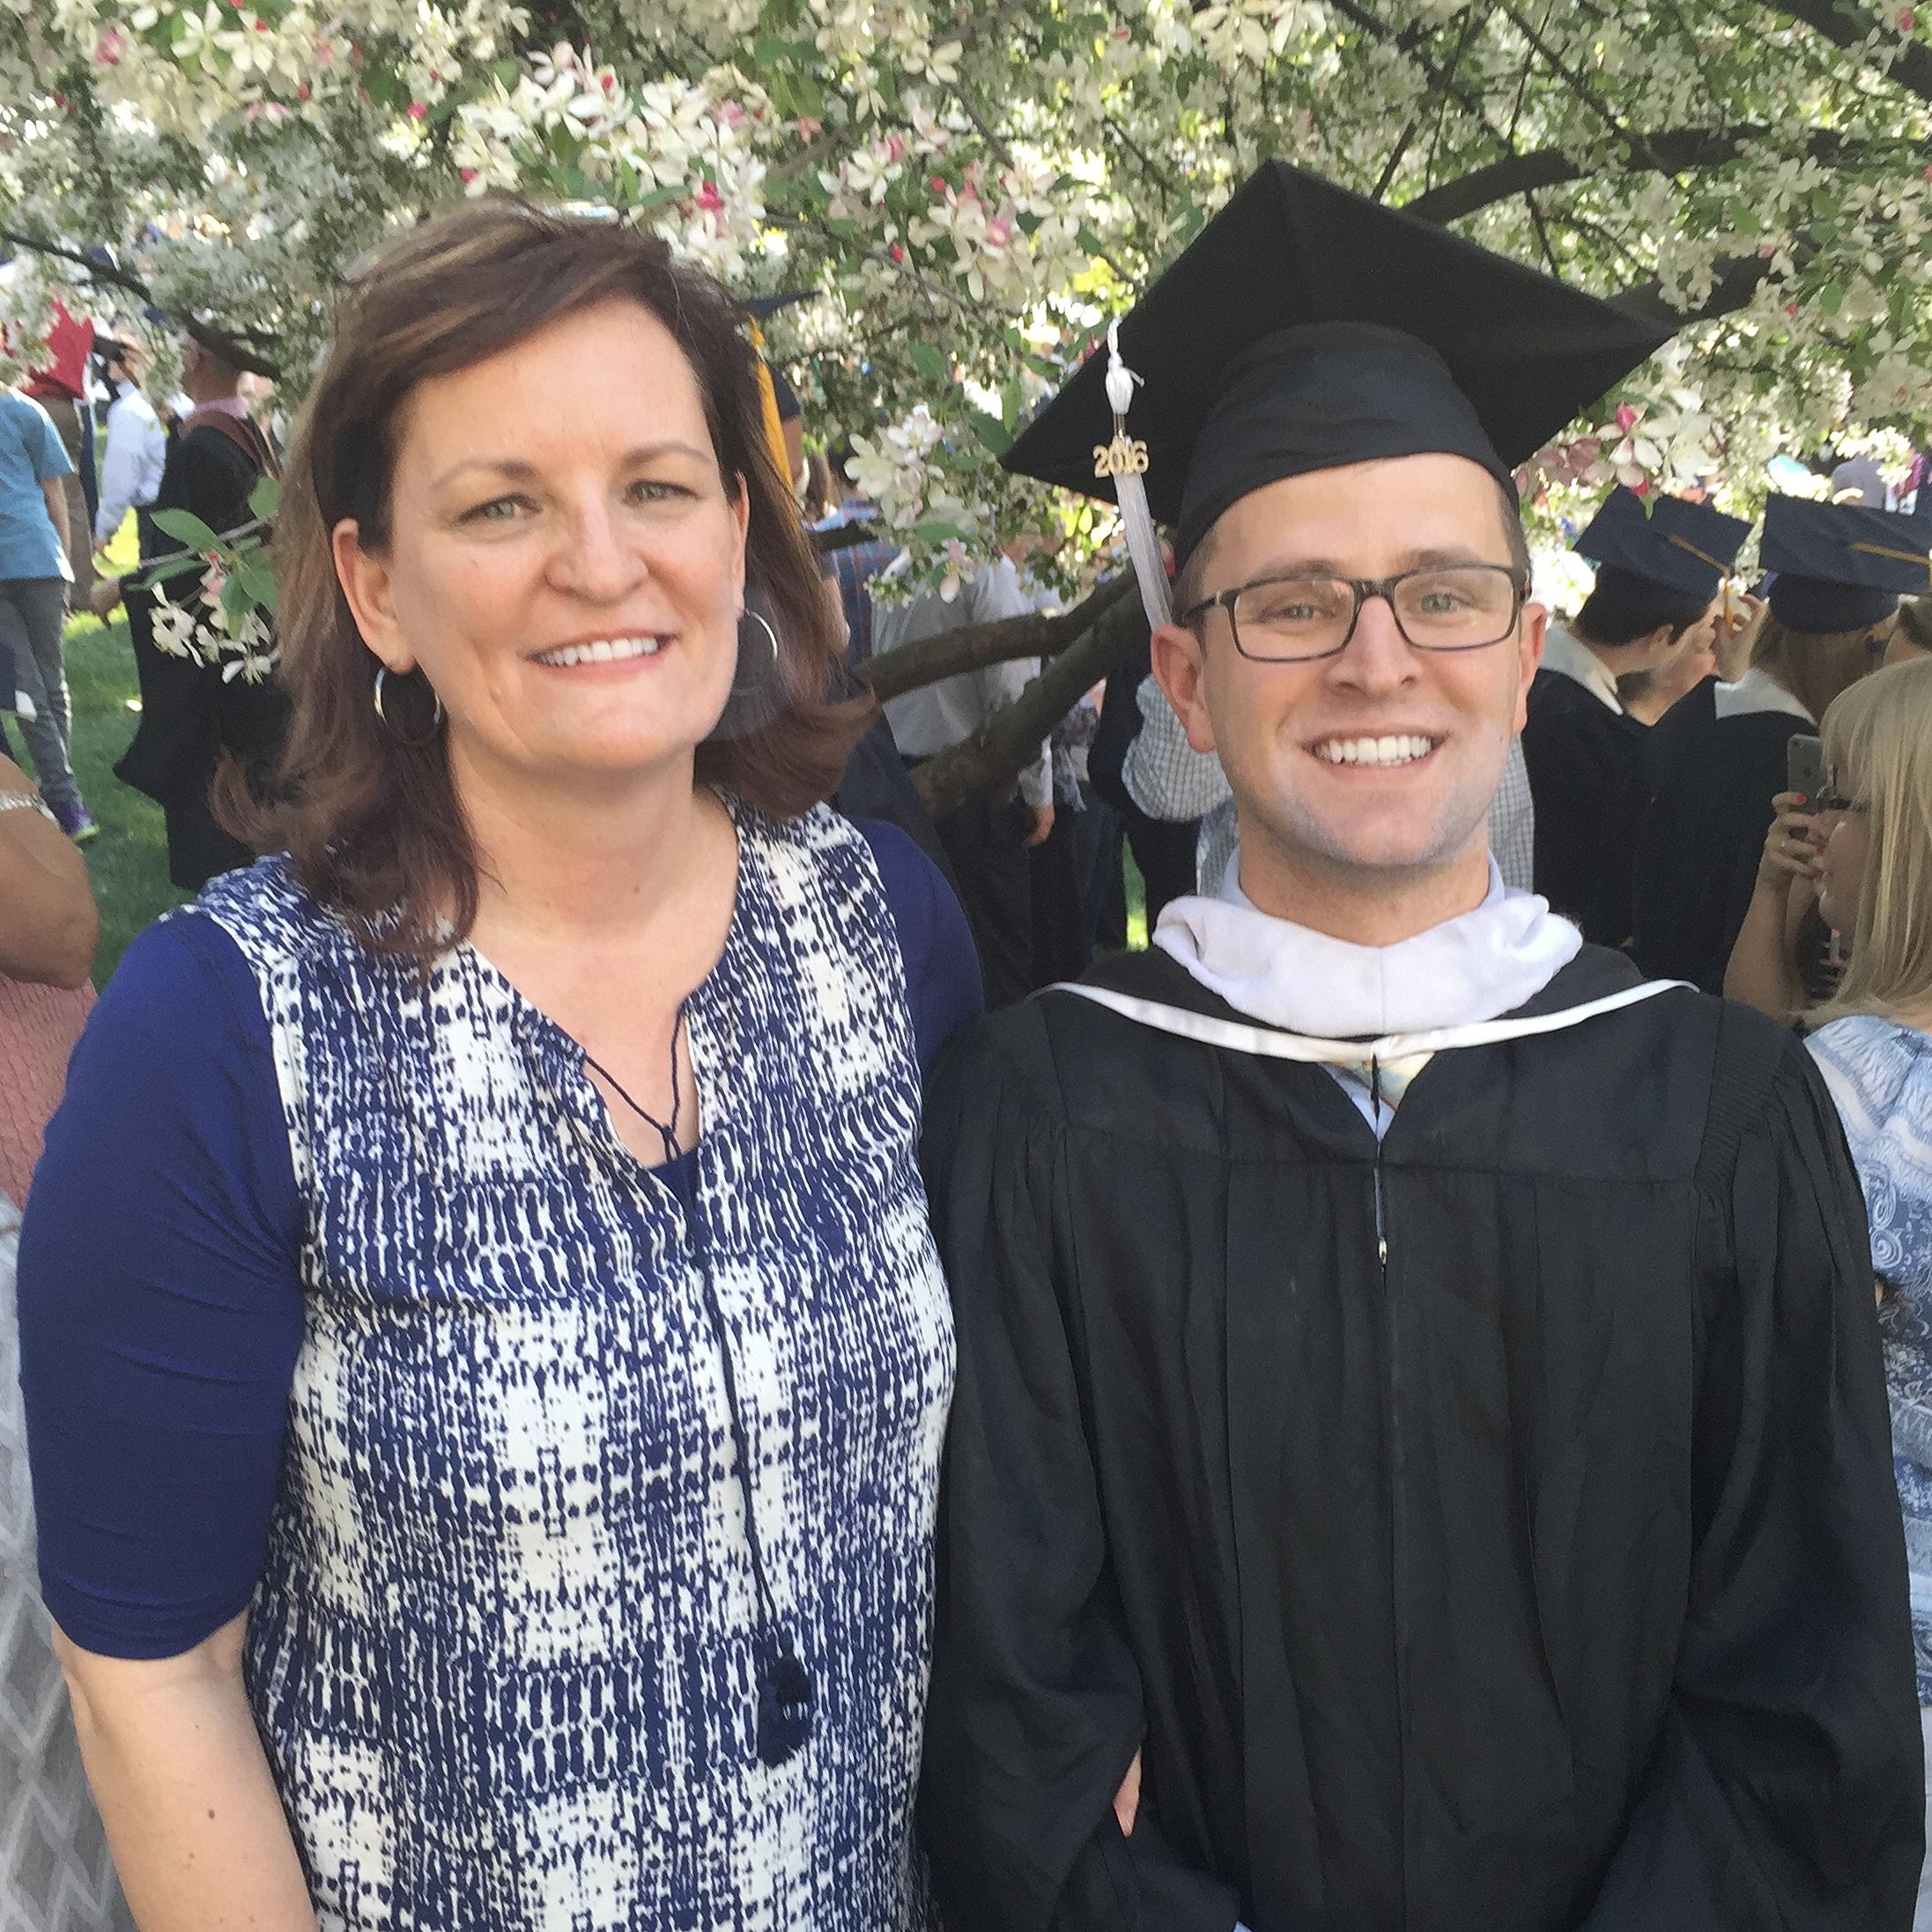 Ellen King standing next to Daniel King in his graduation cap and gown.